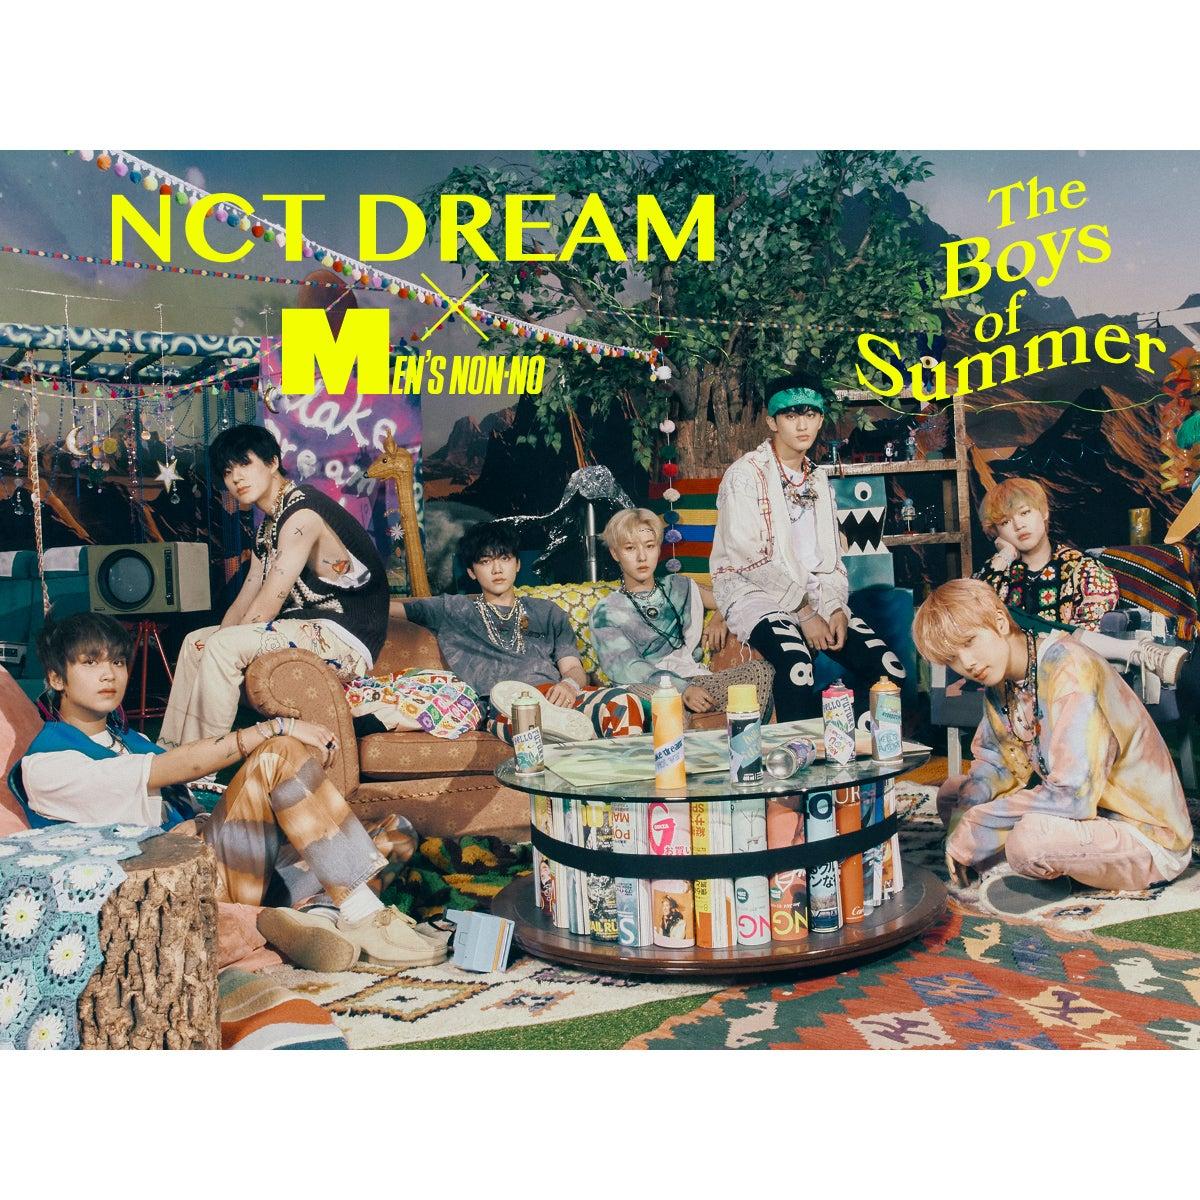 NCT DREAMのメンバー7人に今聞きたい、7つの質問。7日間連続更新中!